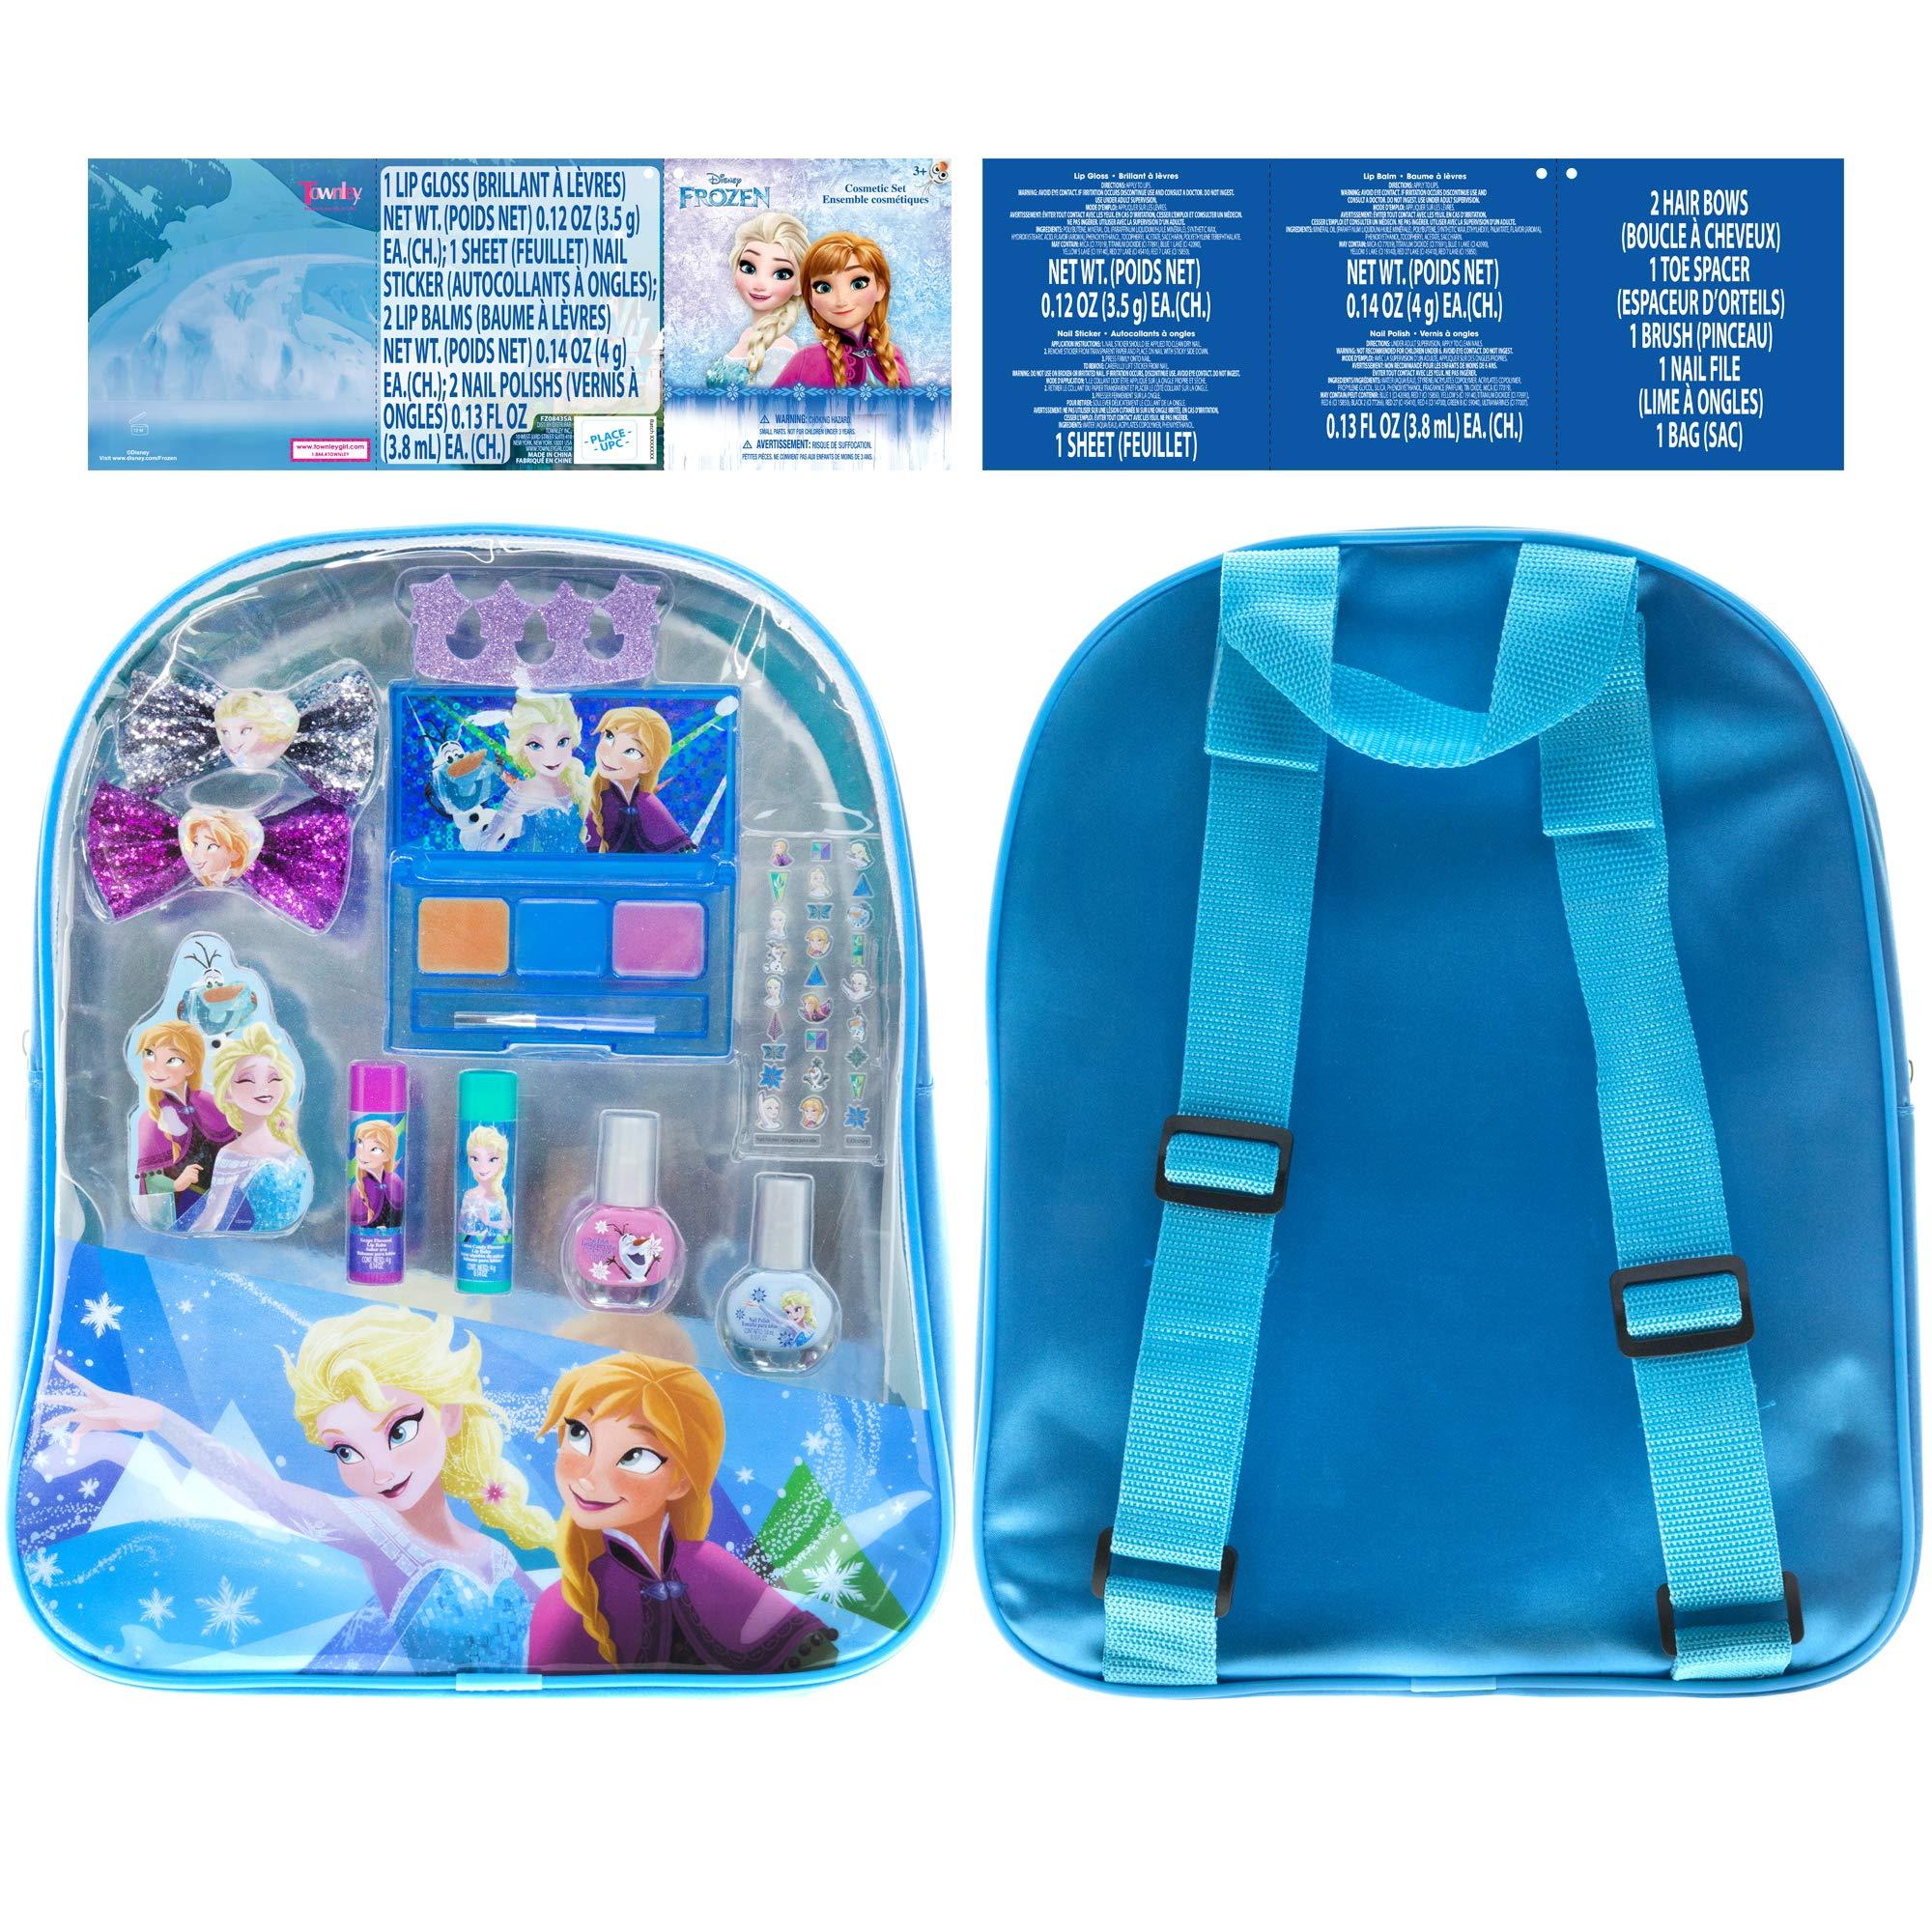 Townley Girl Disney Princess Non Toxic Peel Off Nail: Amazon.com : Frozen Elsa And Anna Kids Washable Mega